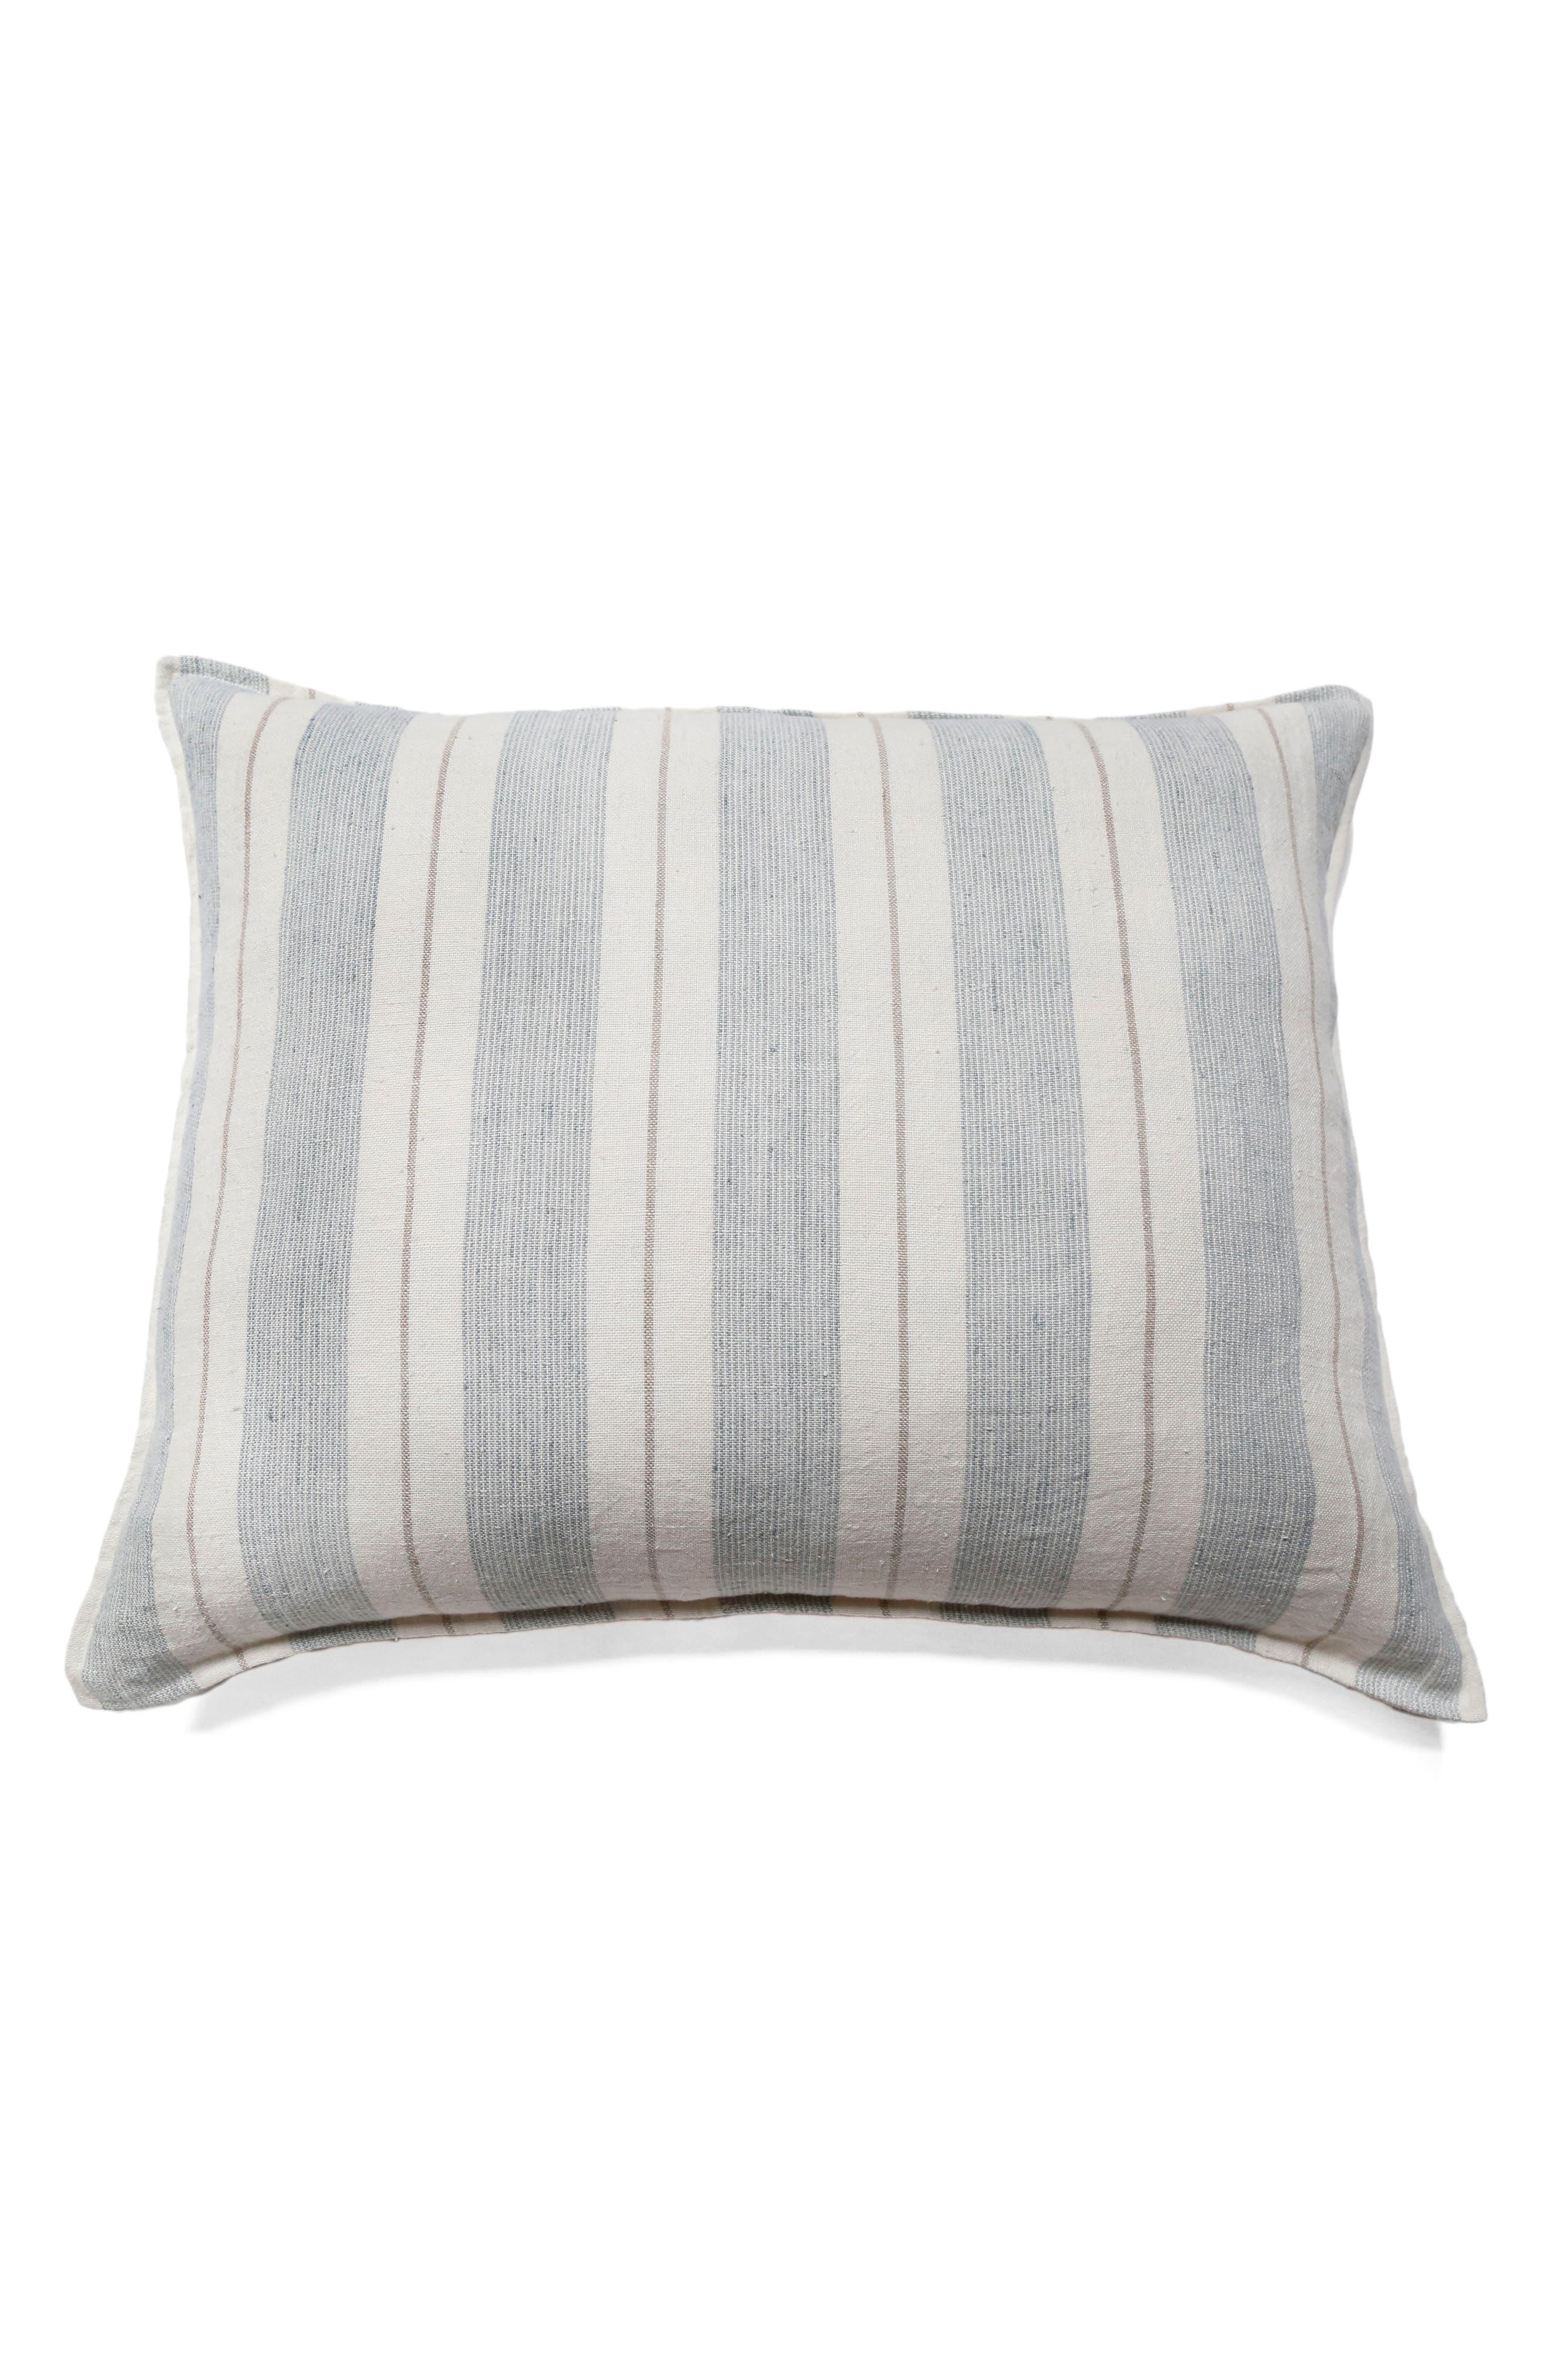 Laguna Big Accent Pillow,                         Main,                         color, BLUE